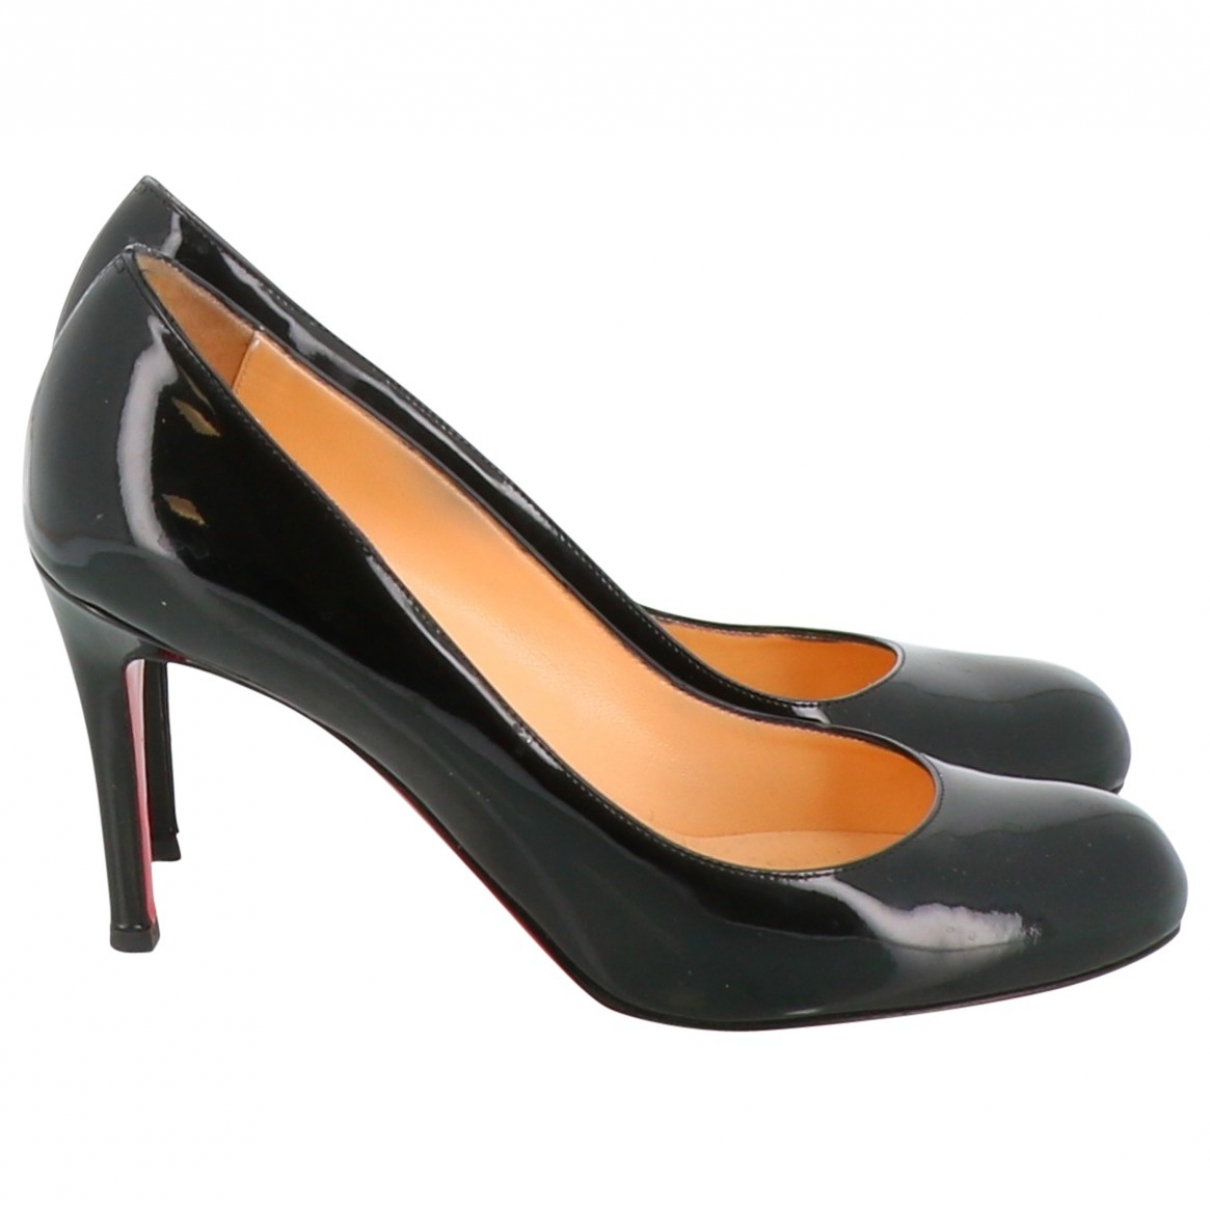 Christian Louboutin Fifi  Black Patent leather Heels for Women 35.5 EU